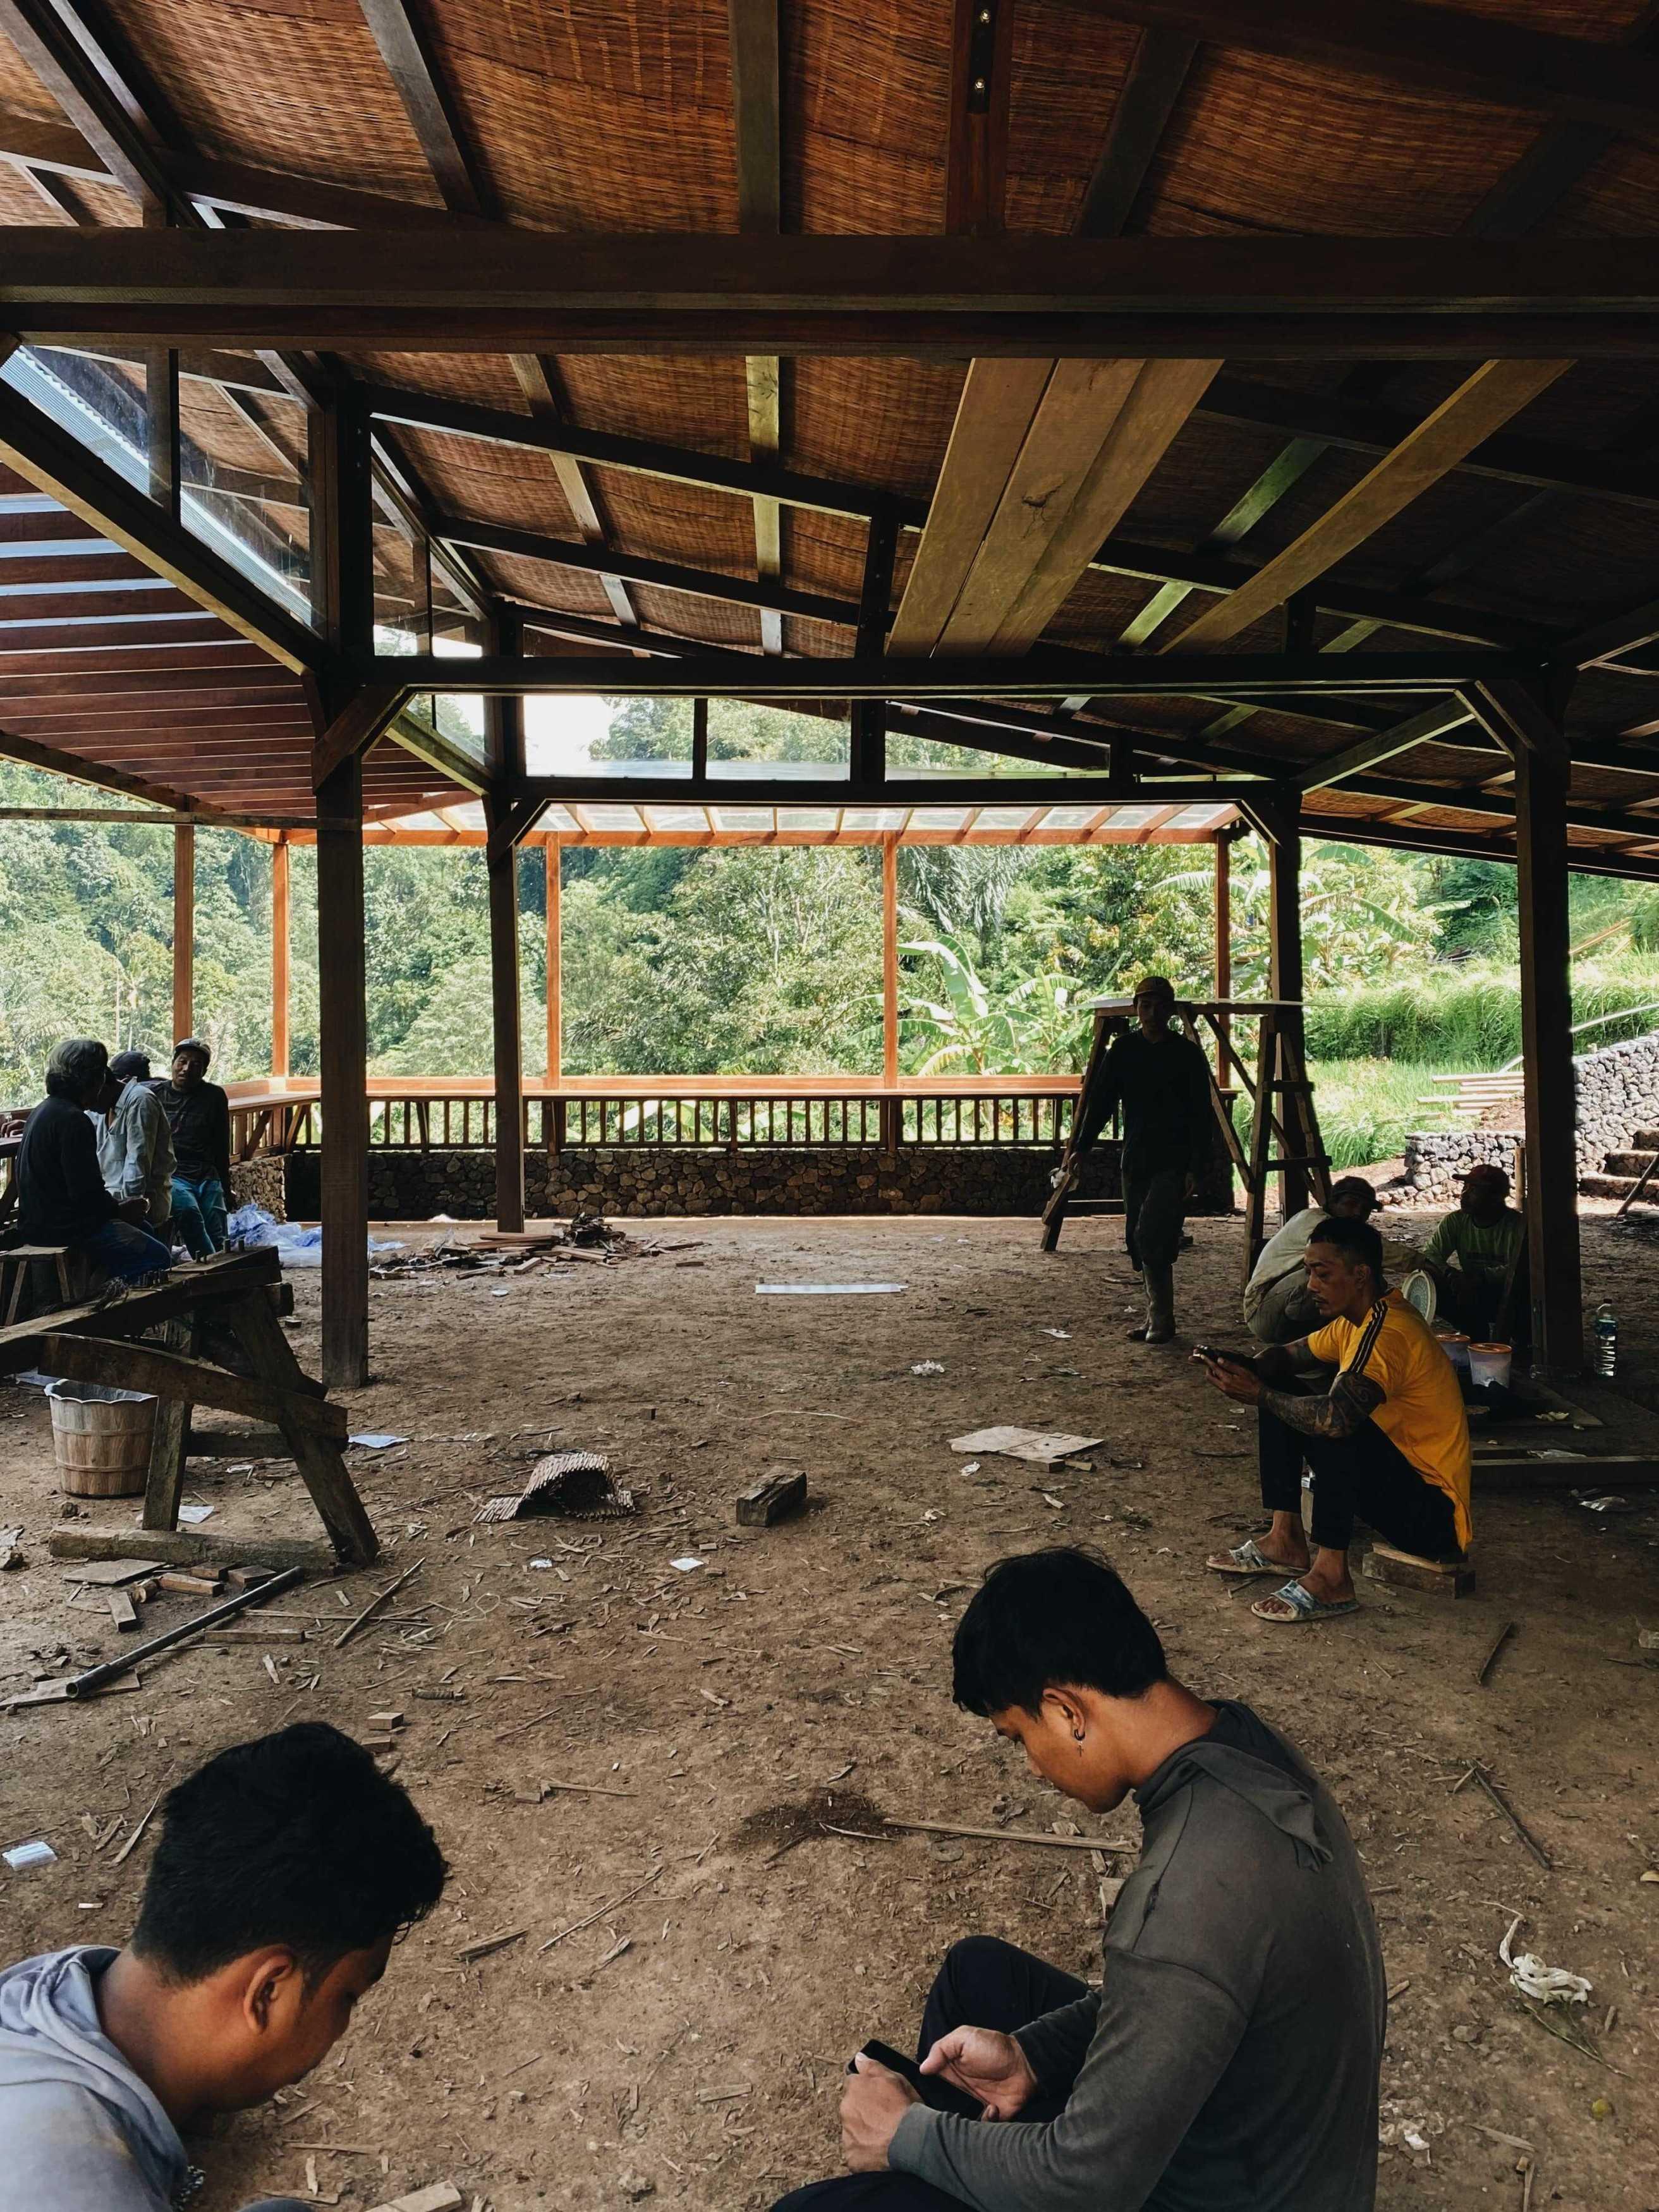 Square Meter Design Studio Plaga Eco Park Plaga, Pelaga, Petang, Kabupaten Badung, Bali, Indonesia Plaga, Pelaga, Petang, Kabupaten Badung, Bali, Indonesia Plaga Eco Park Industrial <P>On Site Progress</p> 126551